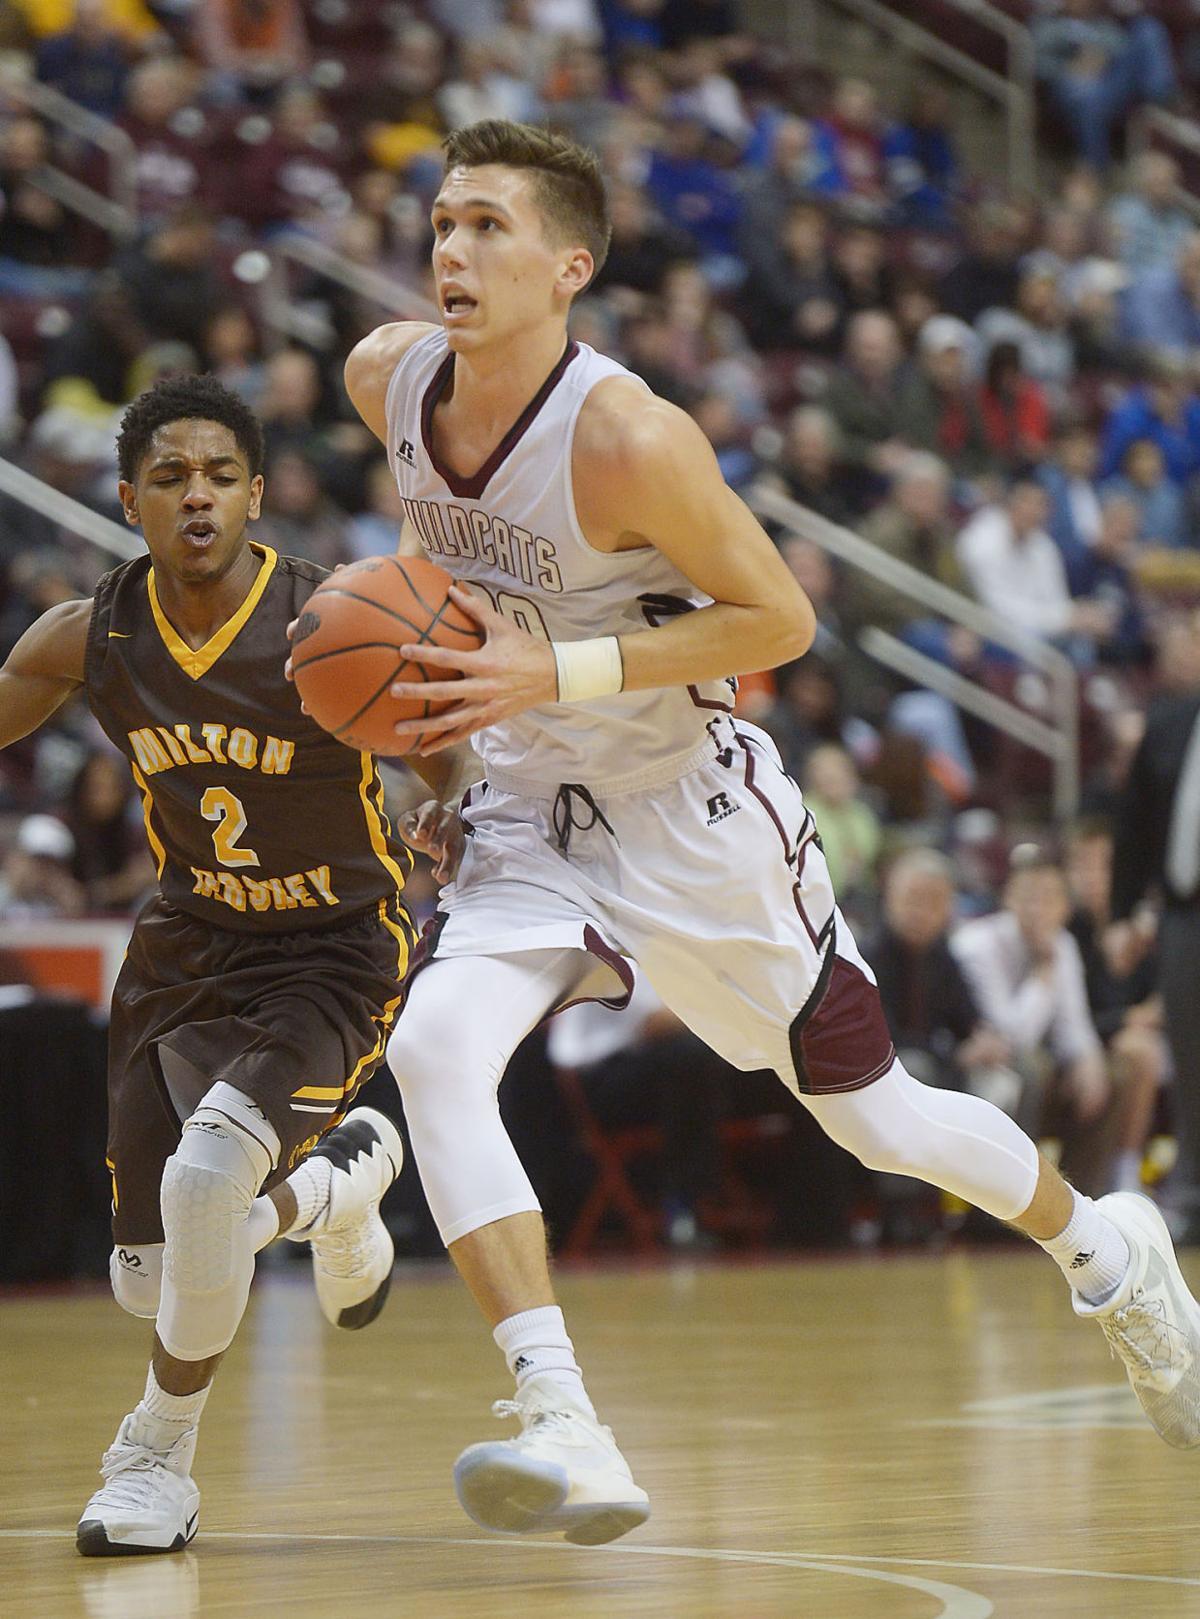 District 3 Class 5A boys basketball: Mechanicsburg vs Milton Hershey (copy)